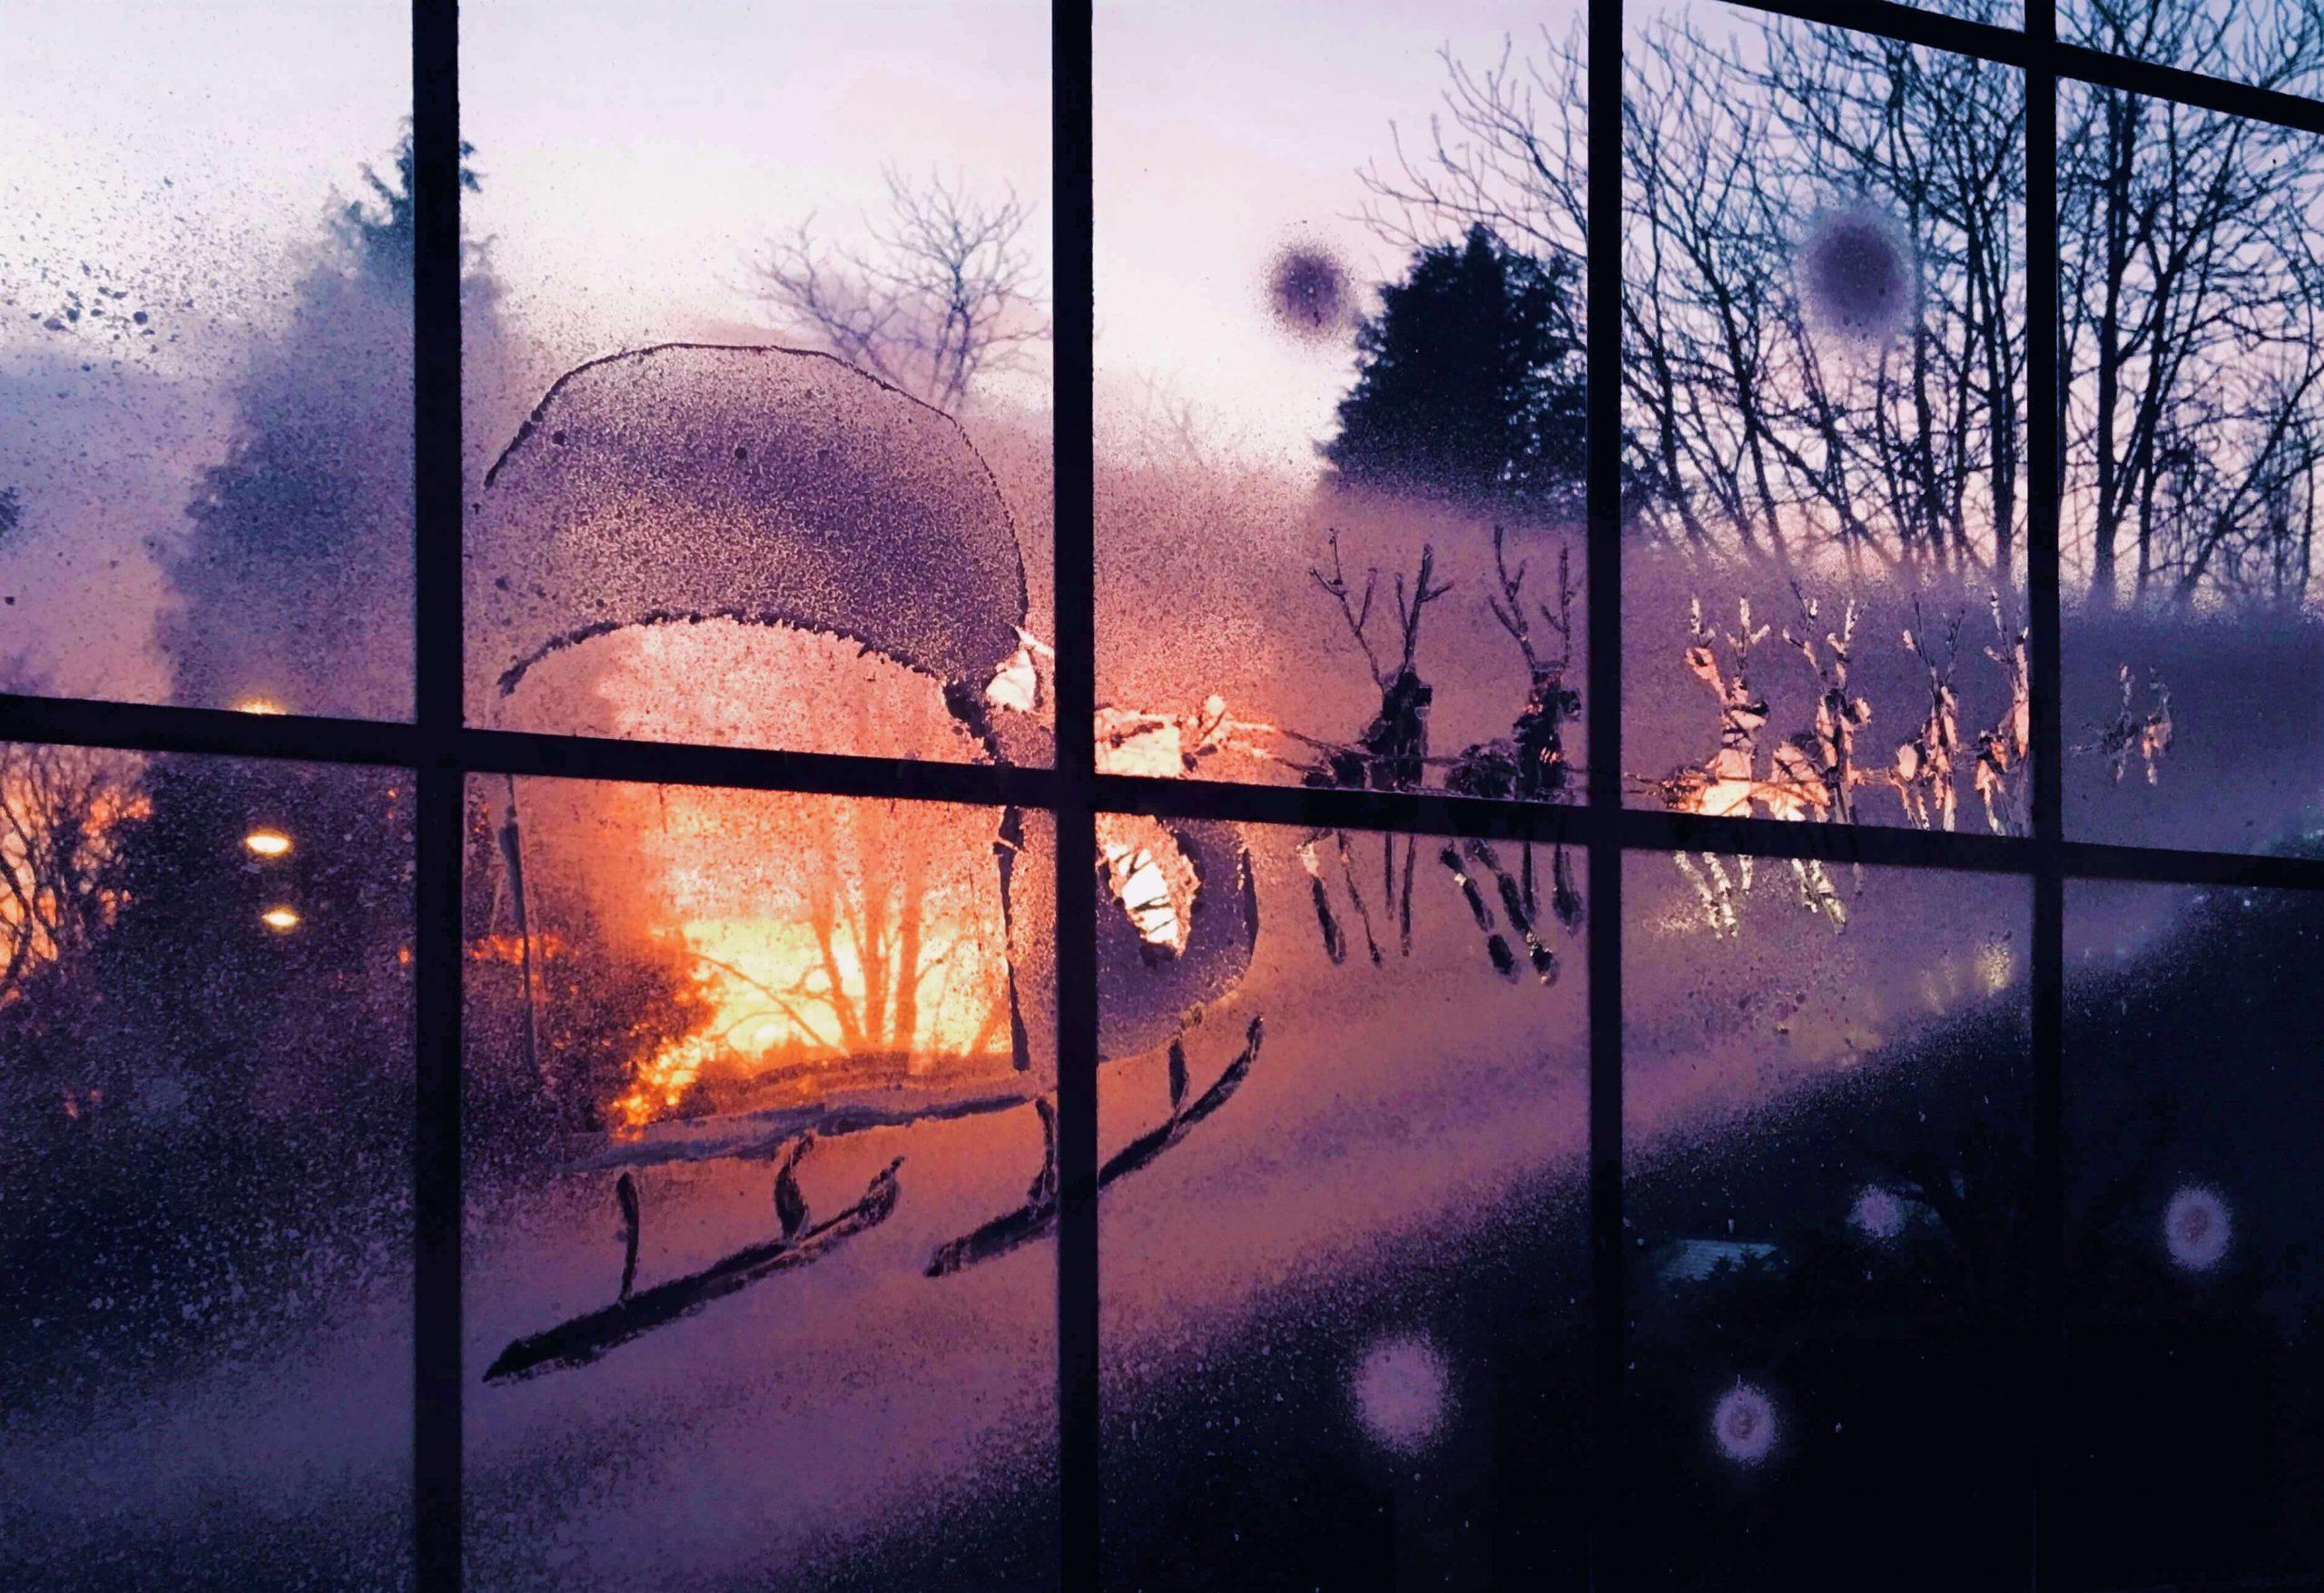 Snow Windows Santa's Sleigh at Sunset